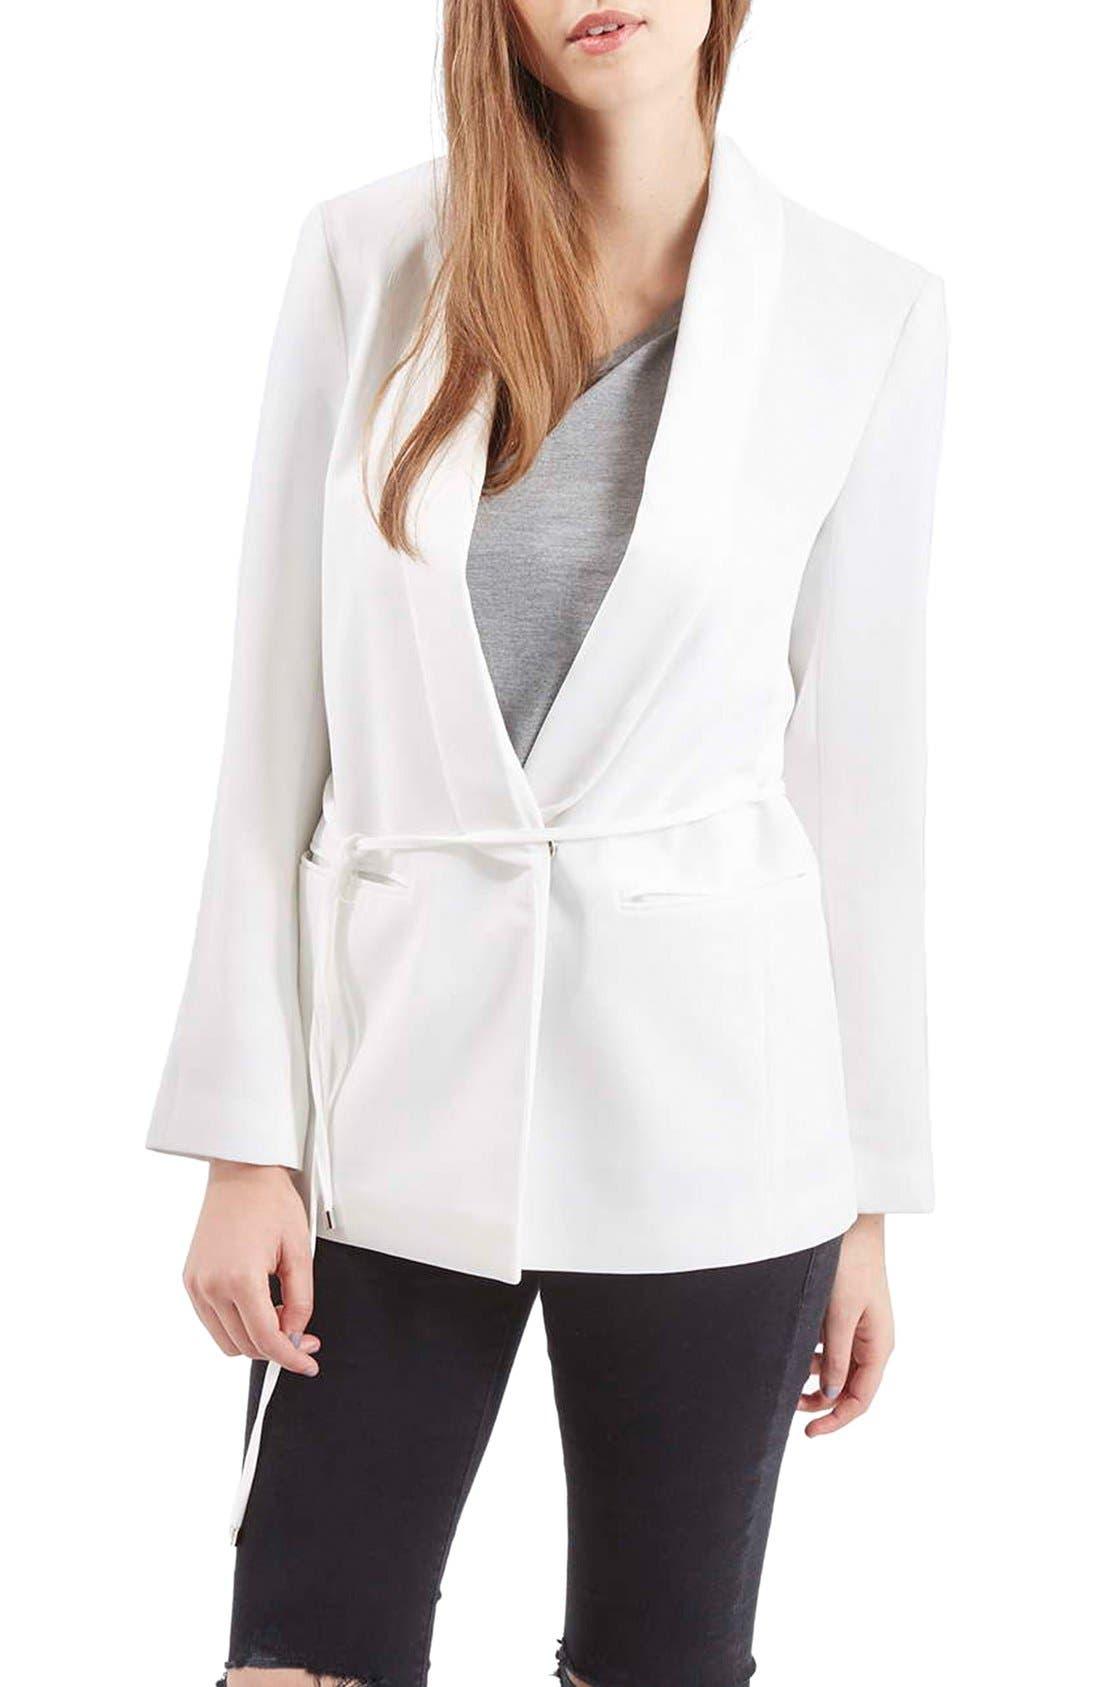 Alternate Image 1 Selected - Topshop Belted Tuxedo Jacket